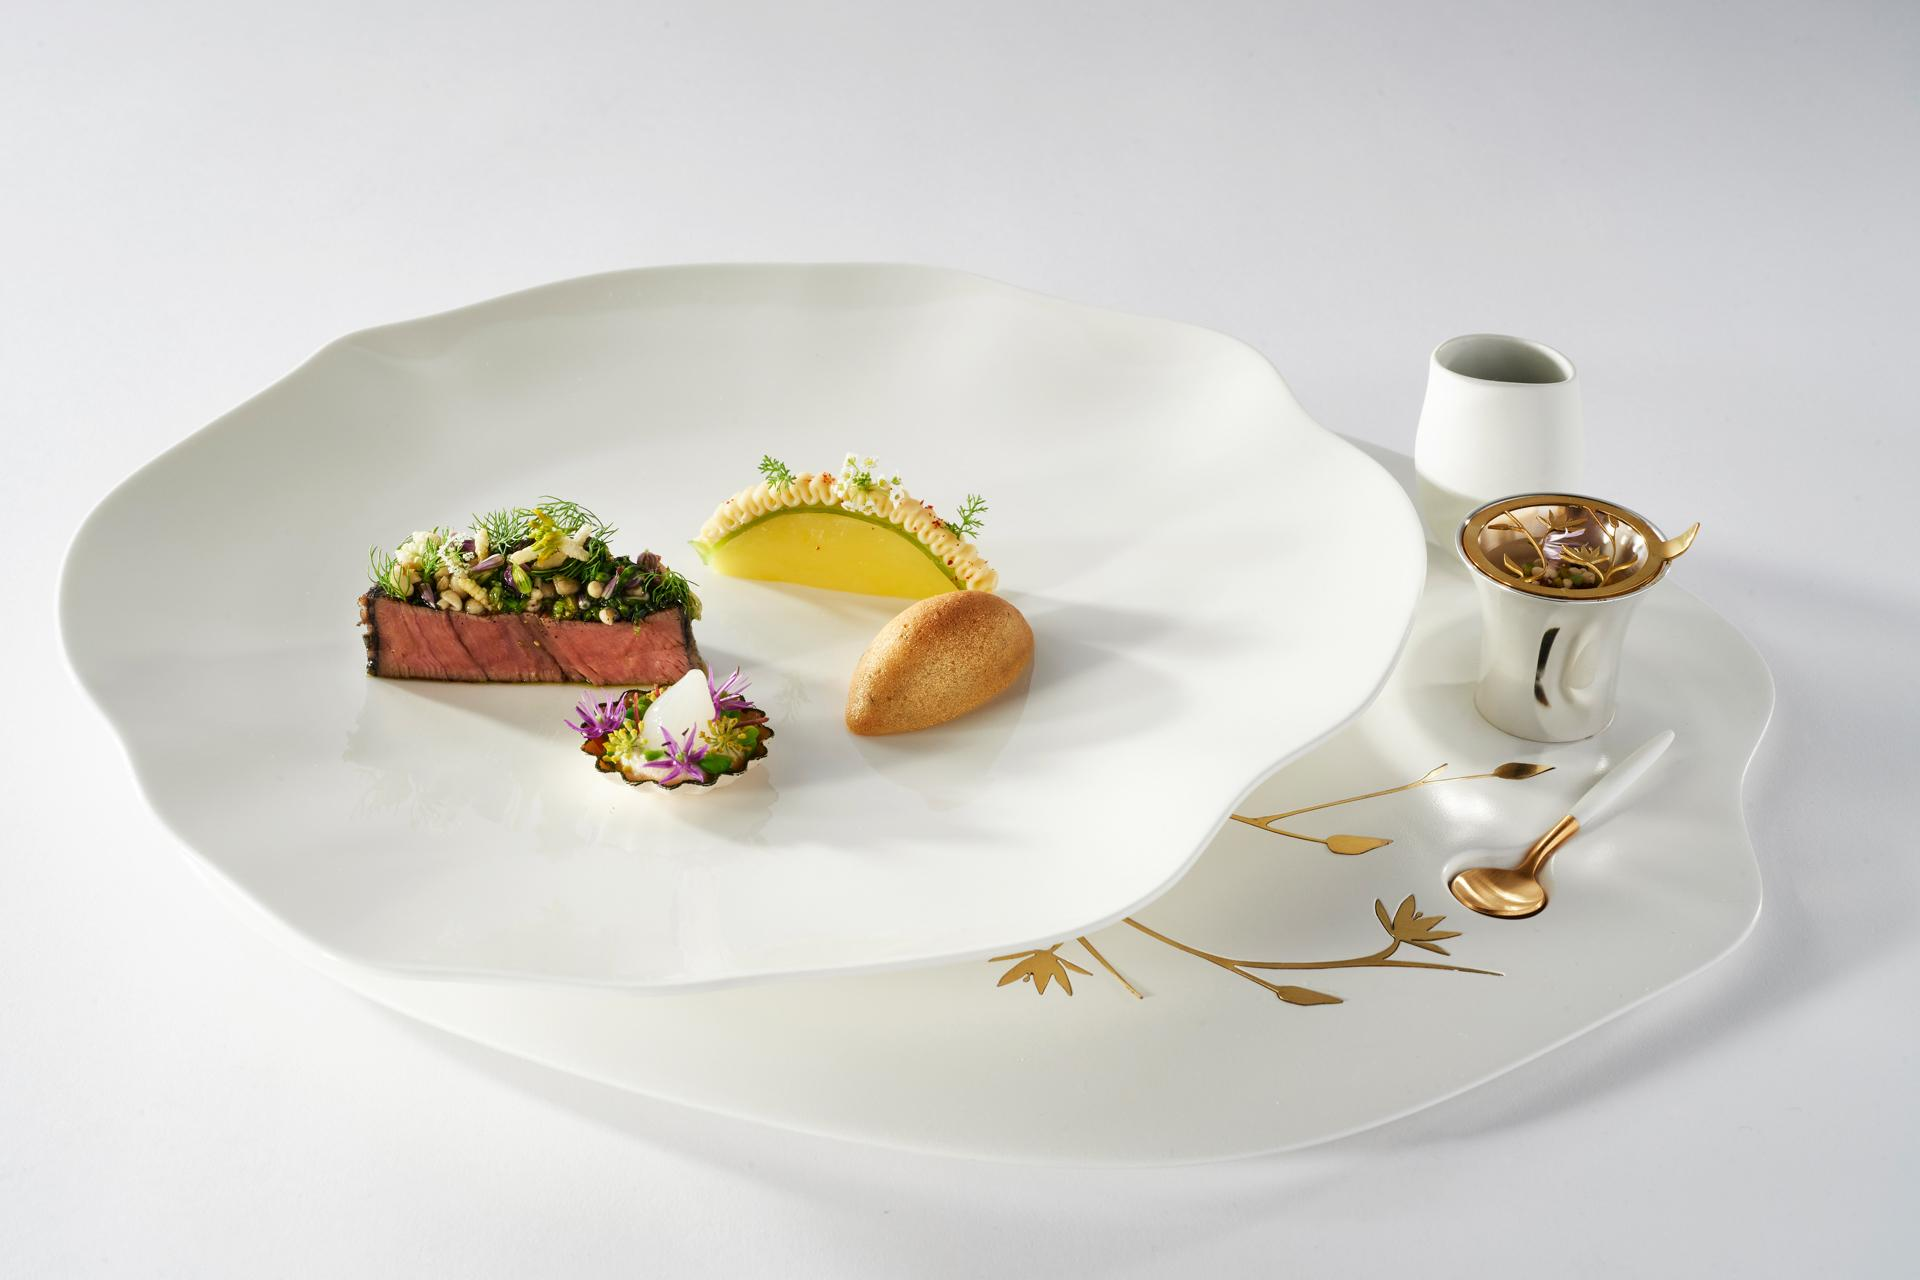 Winning dish Bocuse d'Or 2018 - Norway